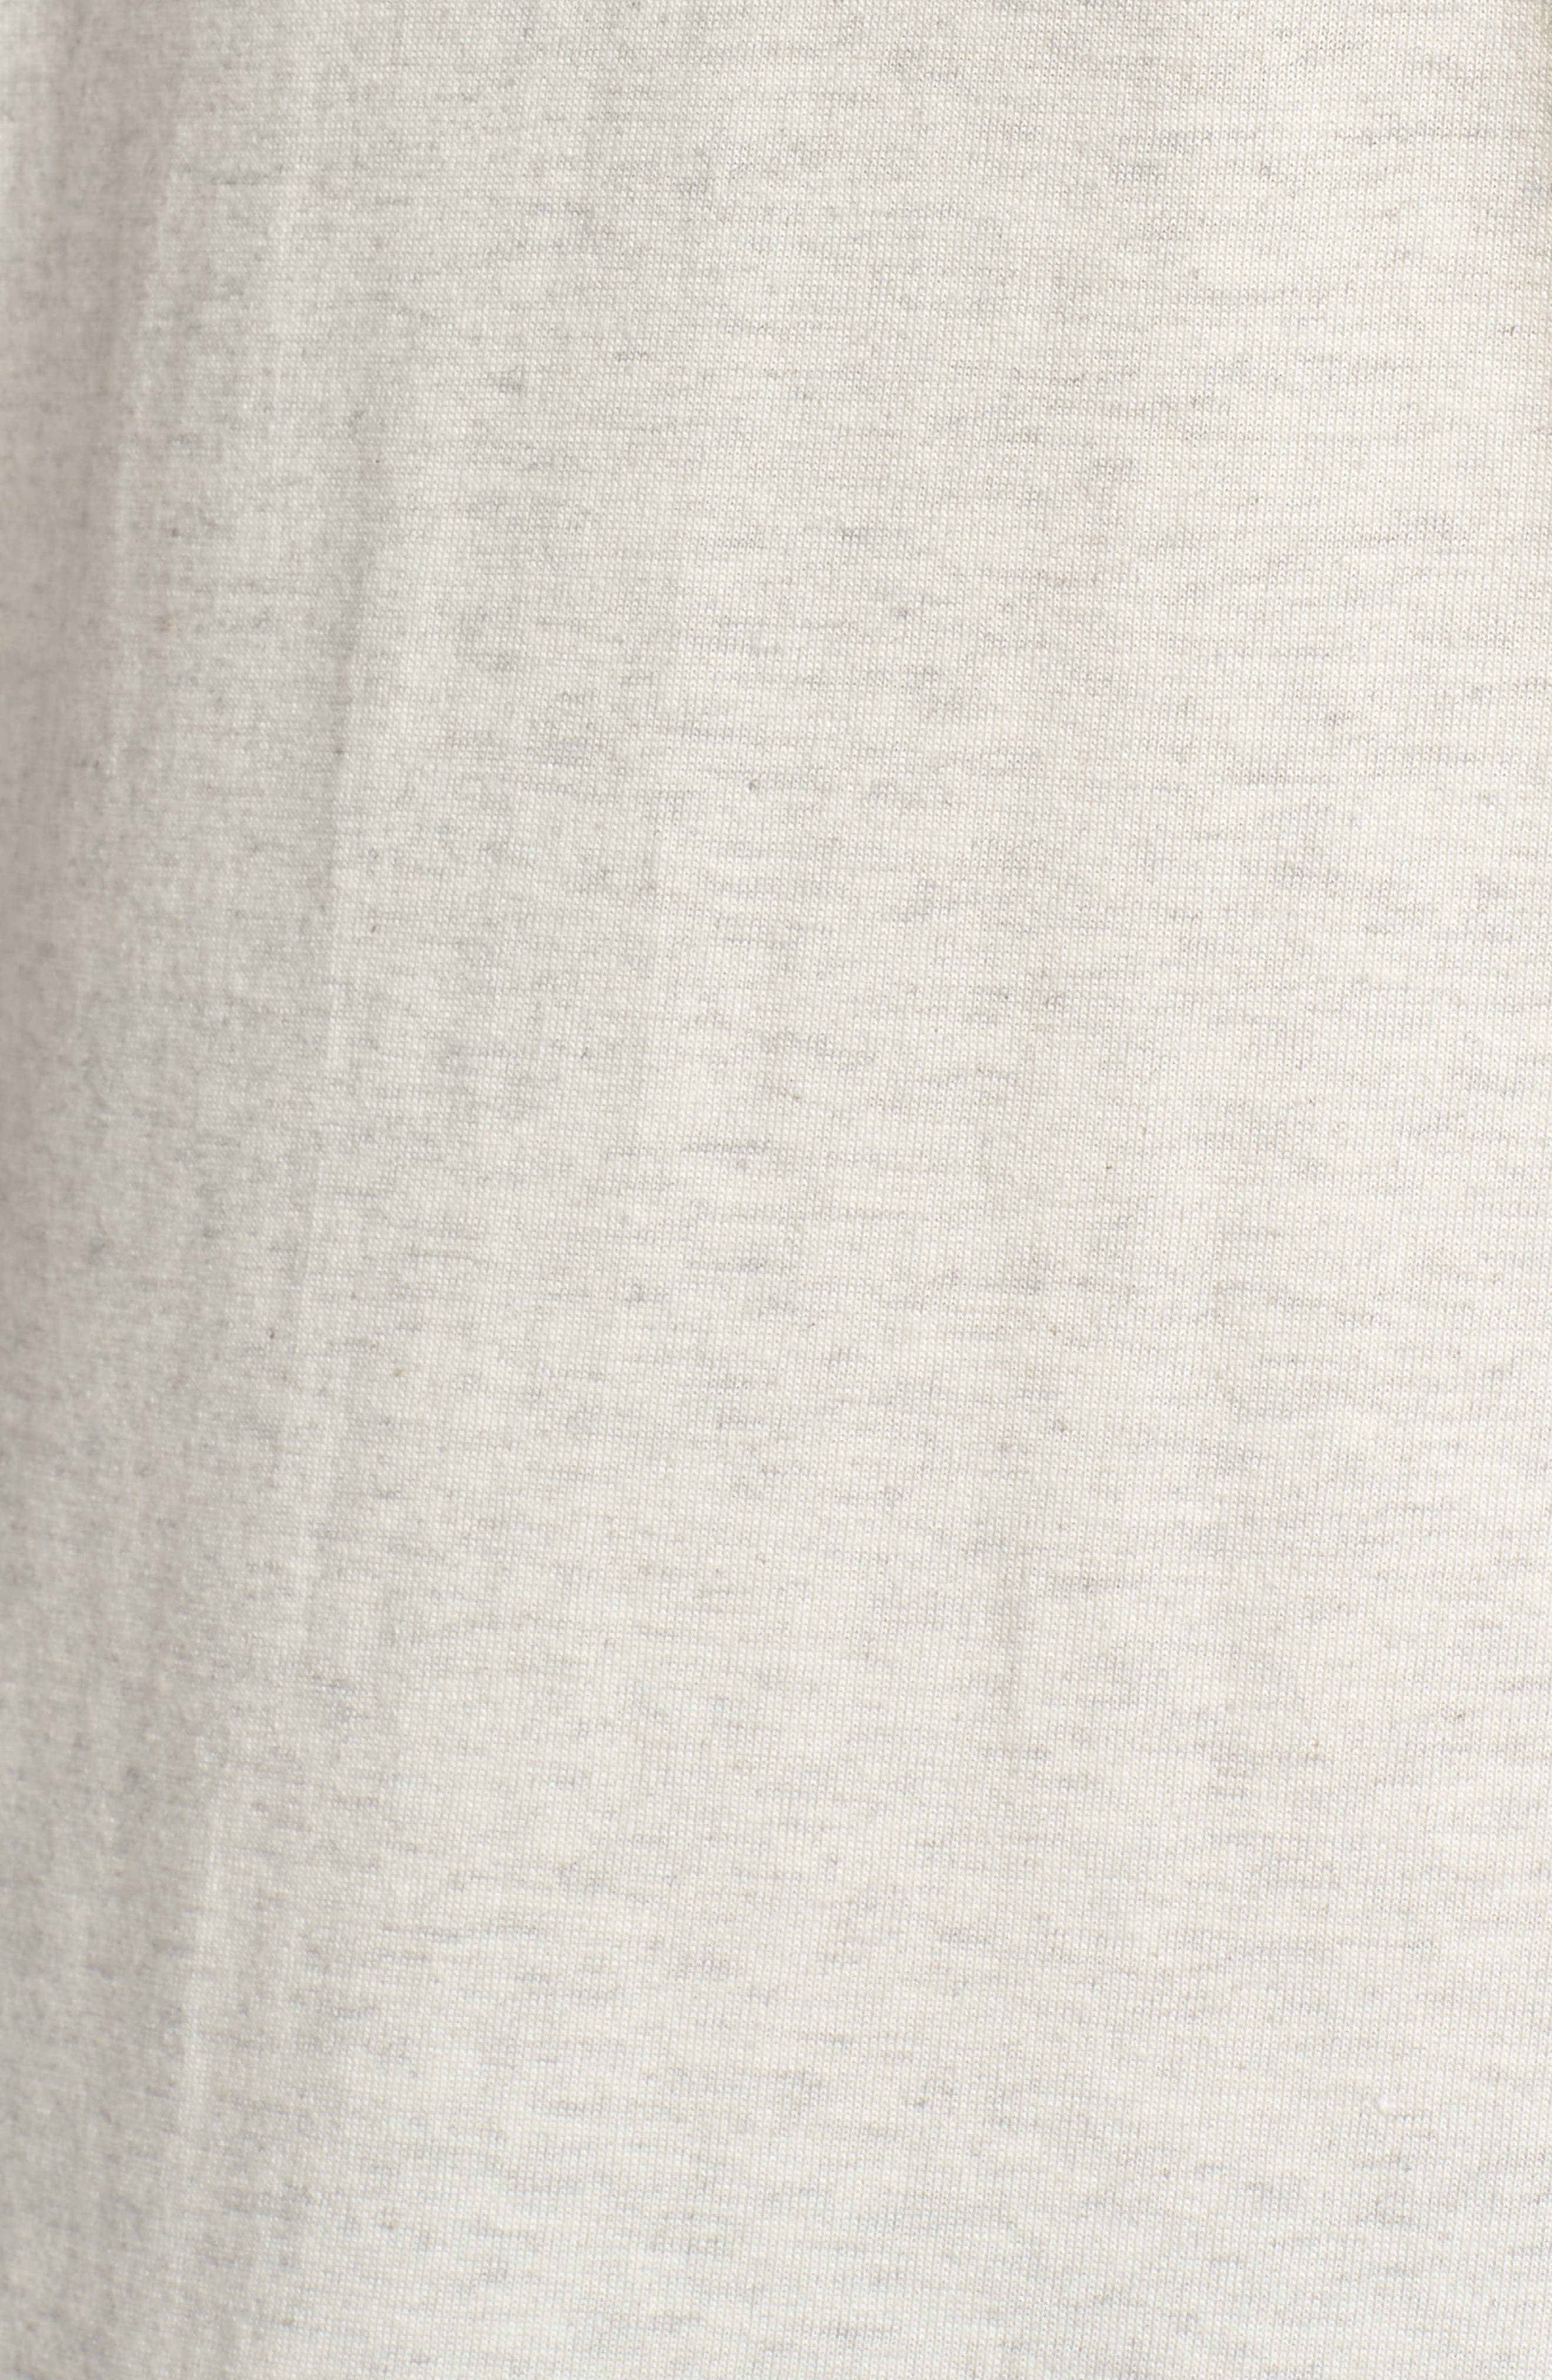 Supreme Comfort Crewneck T-Shirt,                             Alternate thumbnail 5, color,                             Sand Heather/ Bright Navy